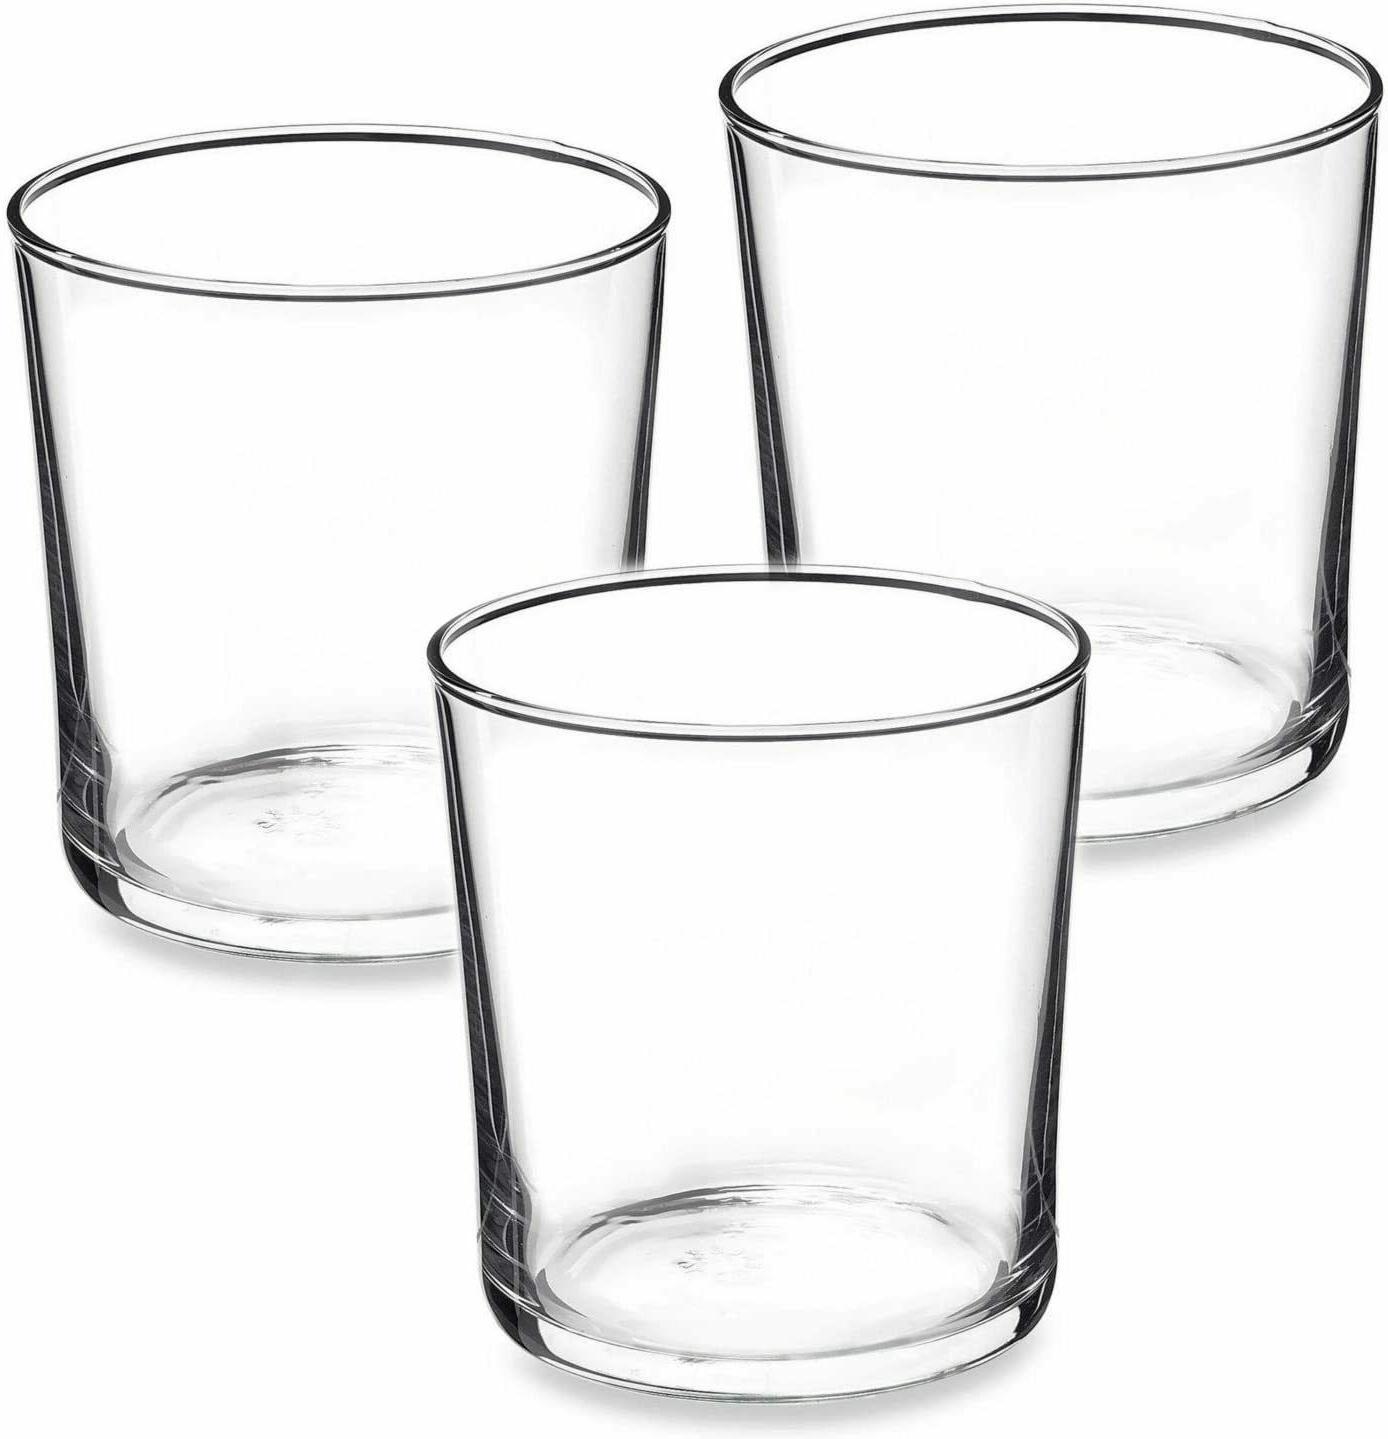 Bormioli Of Clear Tempered Glass